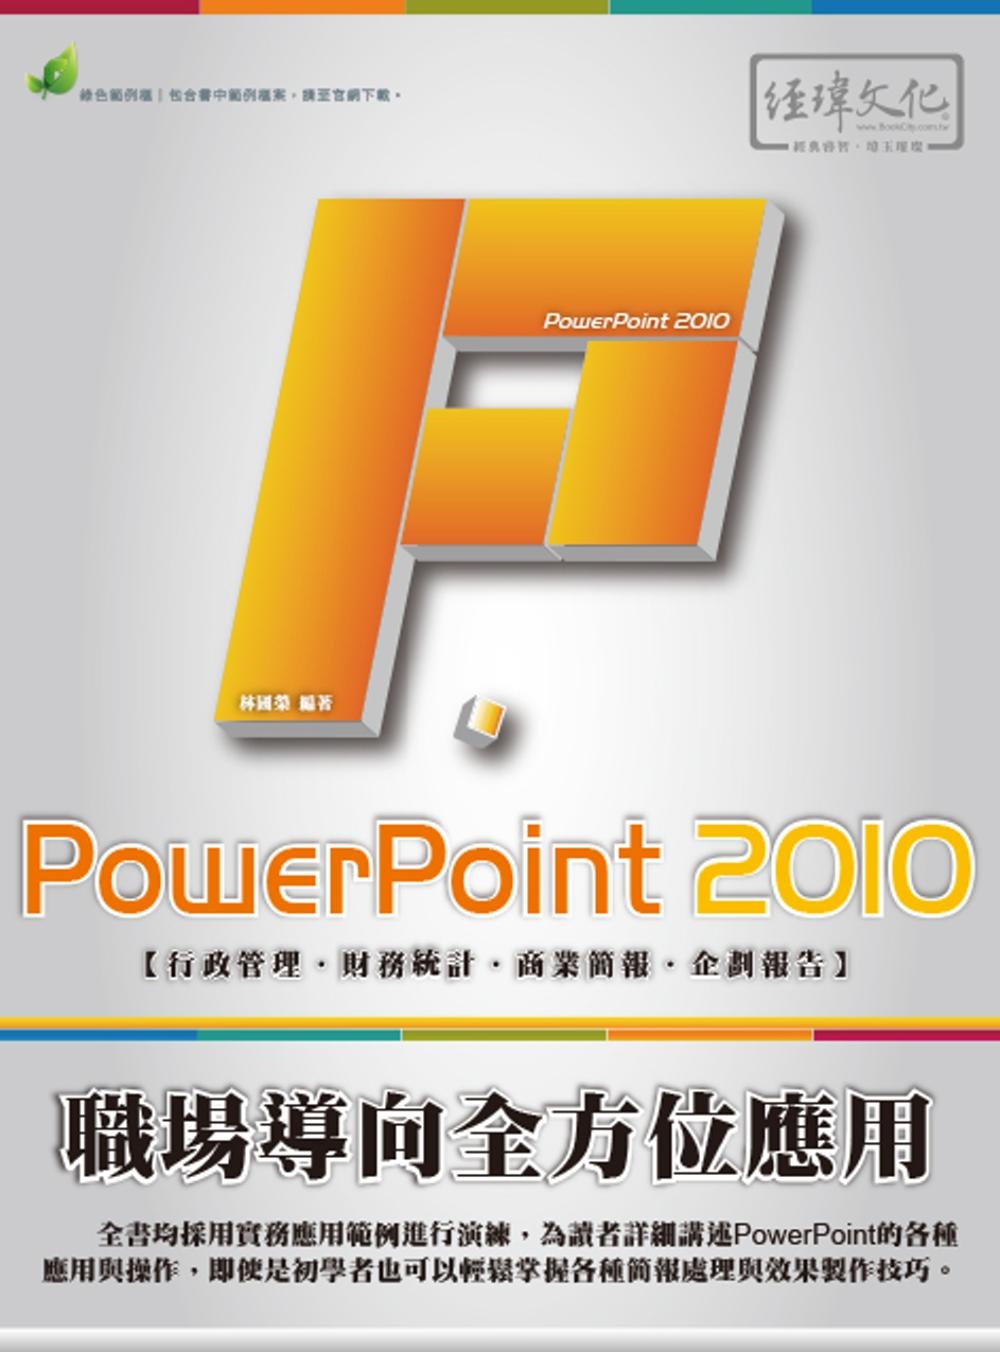 PowerPoint 2010 職場導向全方位應用(附綠色範例檔)